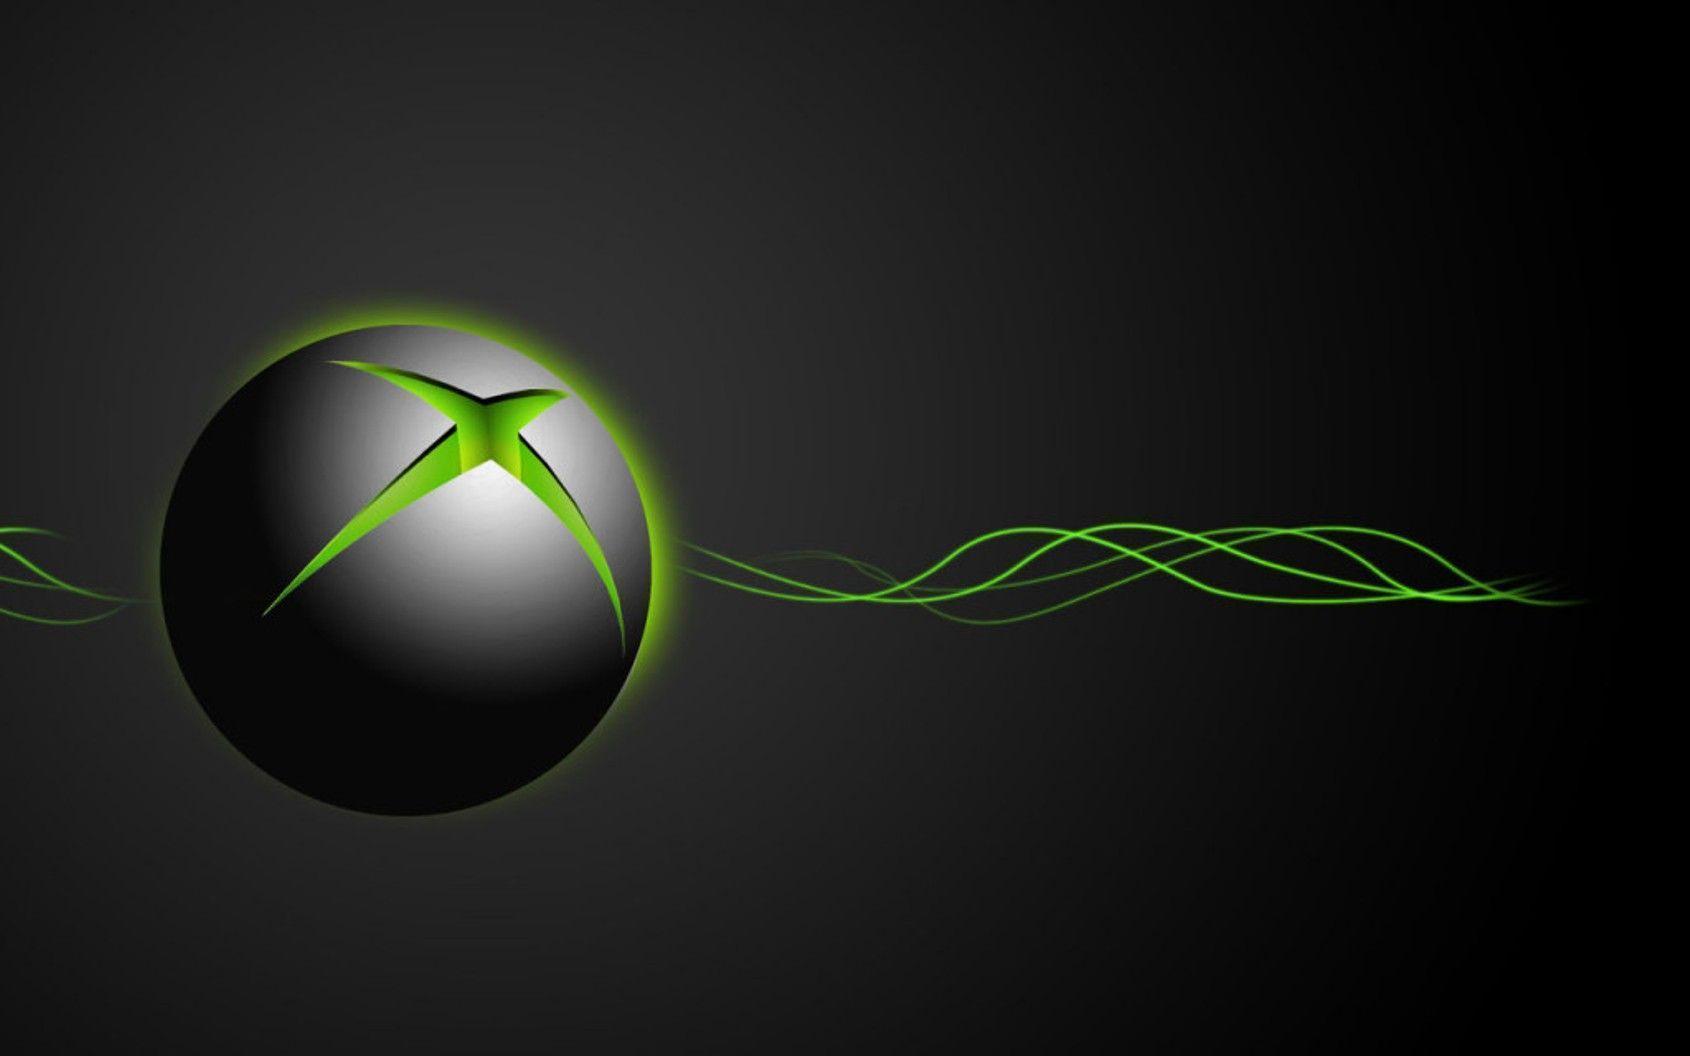 Xbox Logo Wallpapers Top Free Xbox Logo Backgrounds Wallpaperaccess